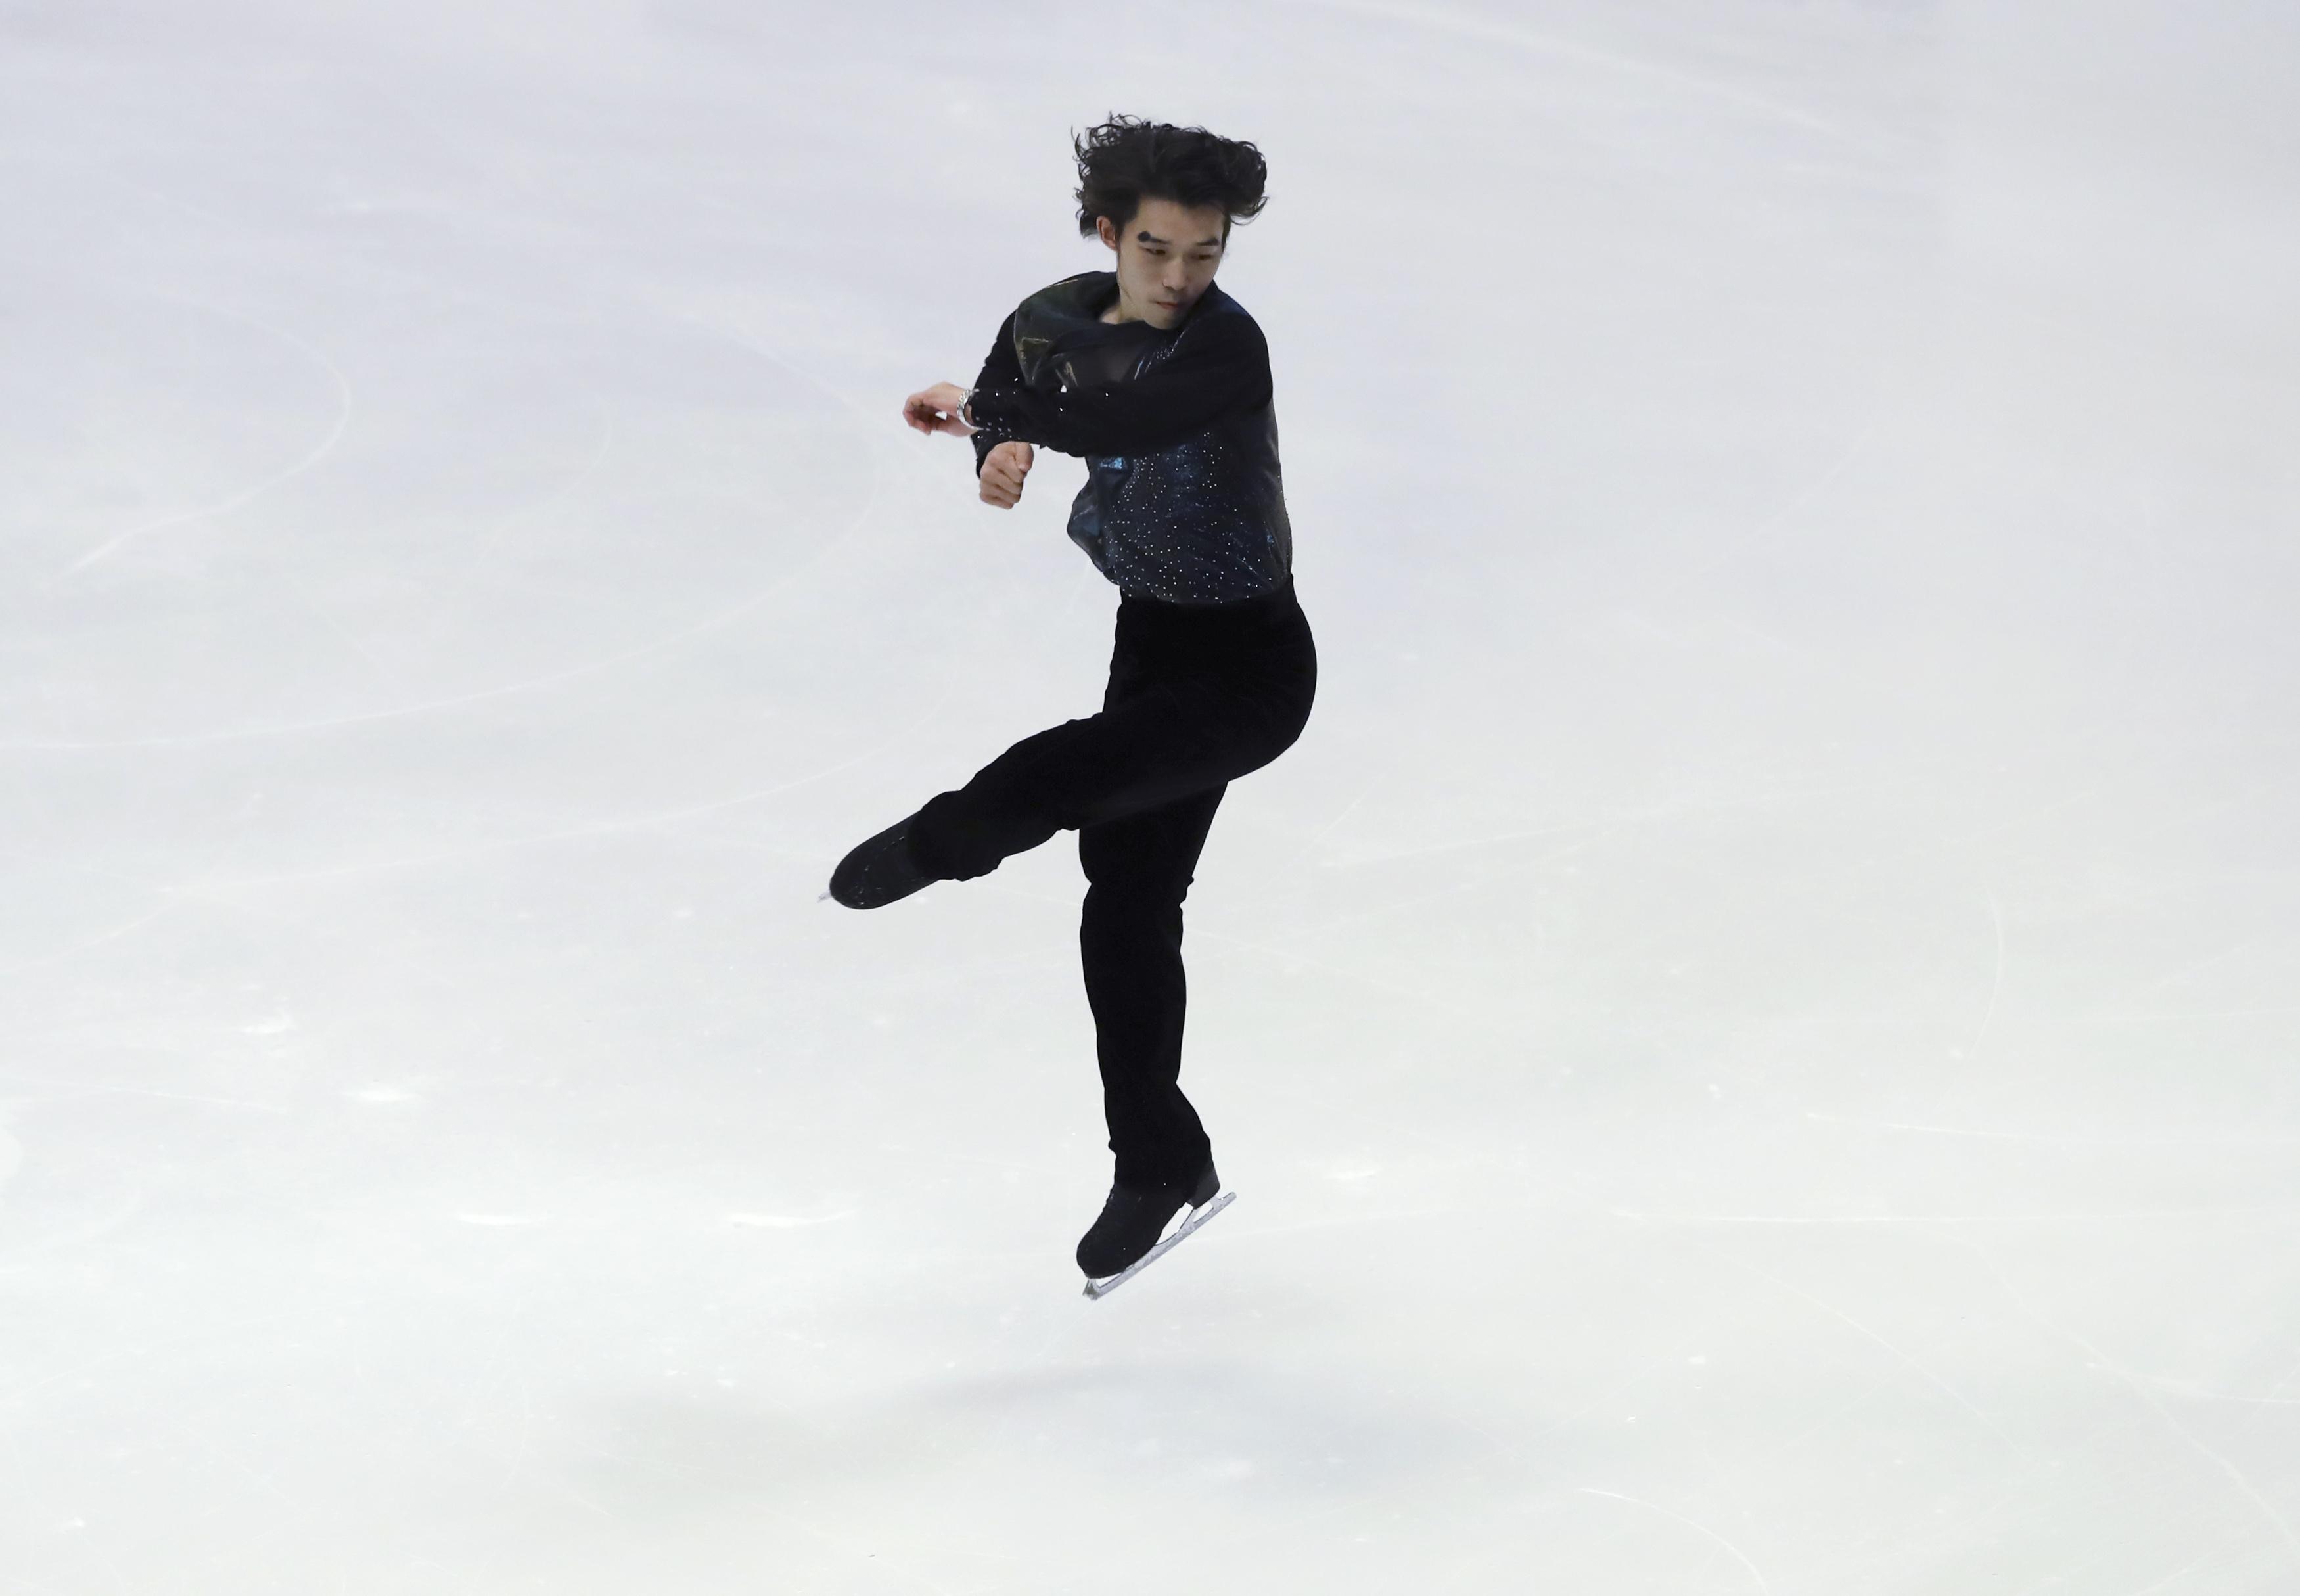 Takahito Mura of Japan performs in the Men's Free Skating program of Figure Skating competition at Makomanai Indoor Skating Rink at the Asian Winter Games in Sapporo, northern Japan, Sunday, Feb. 26, 2017. (AP Photo/Eugene Hoshiko)